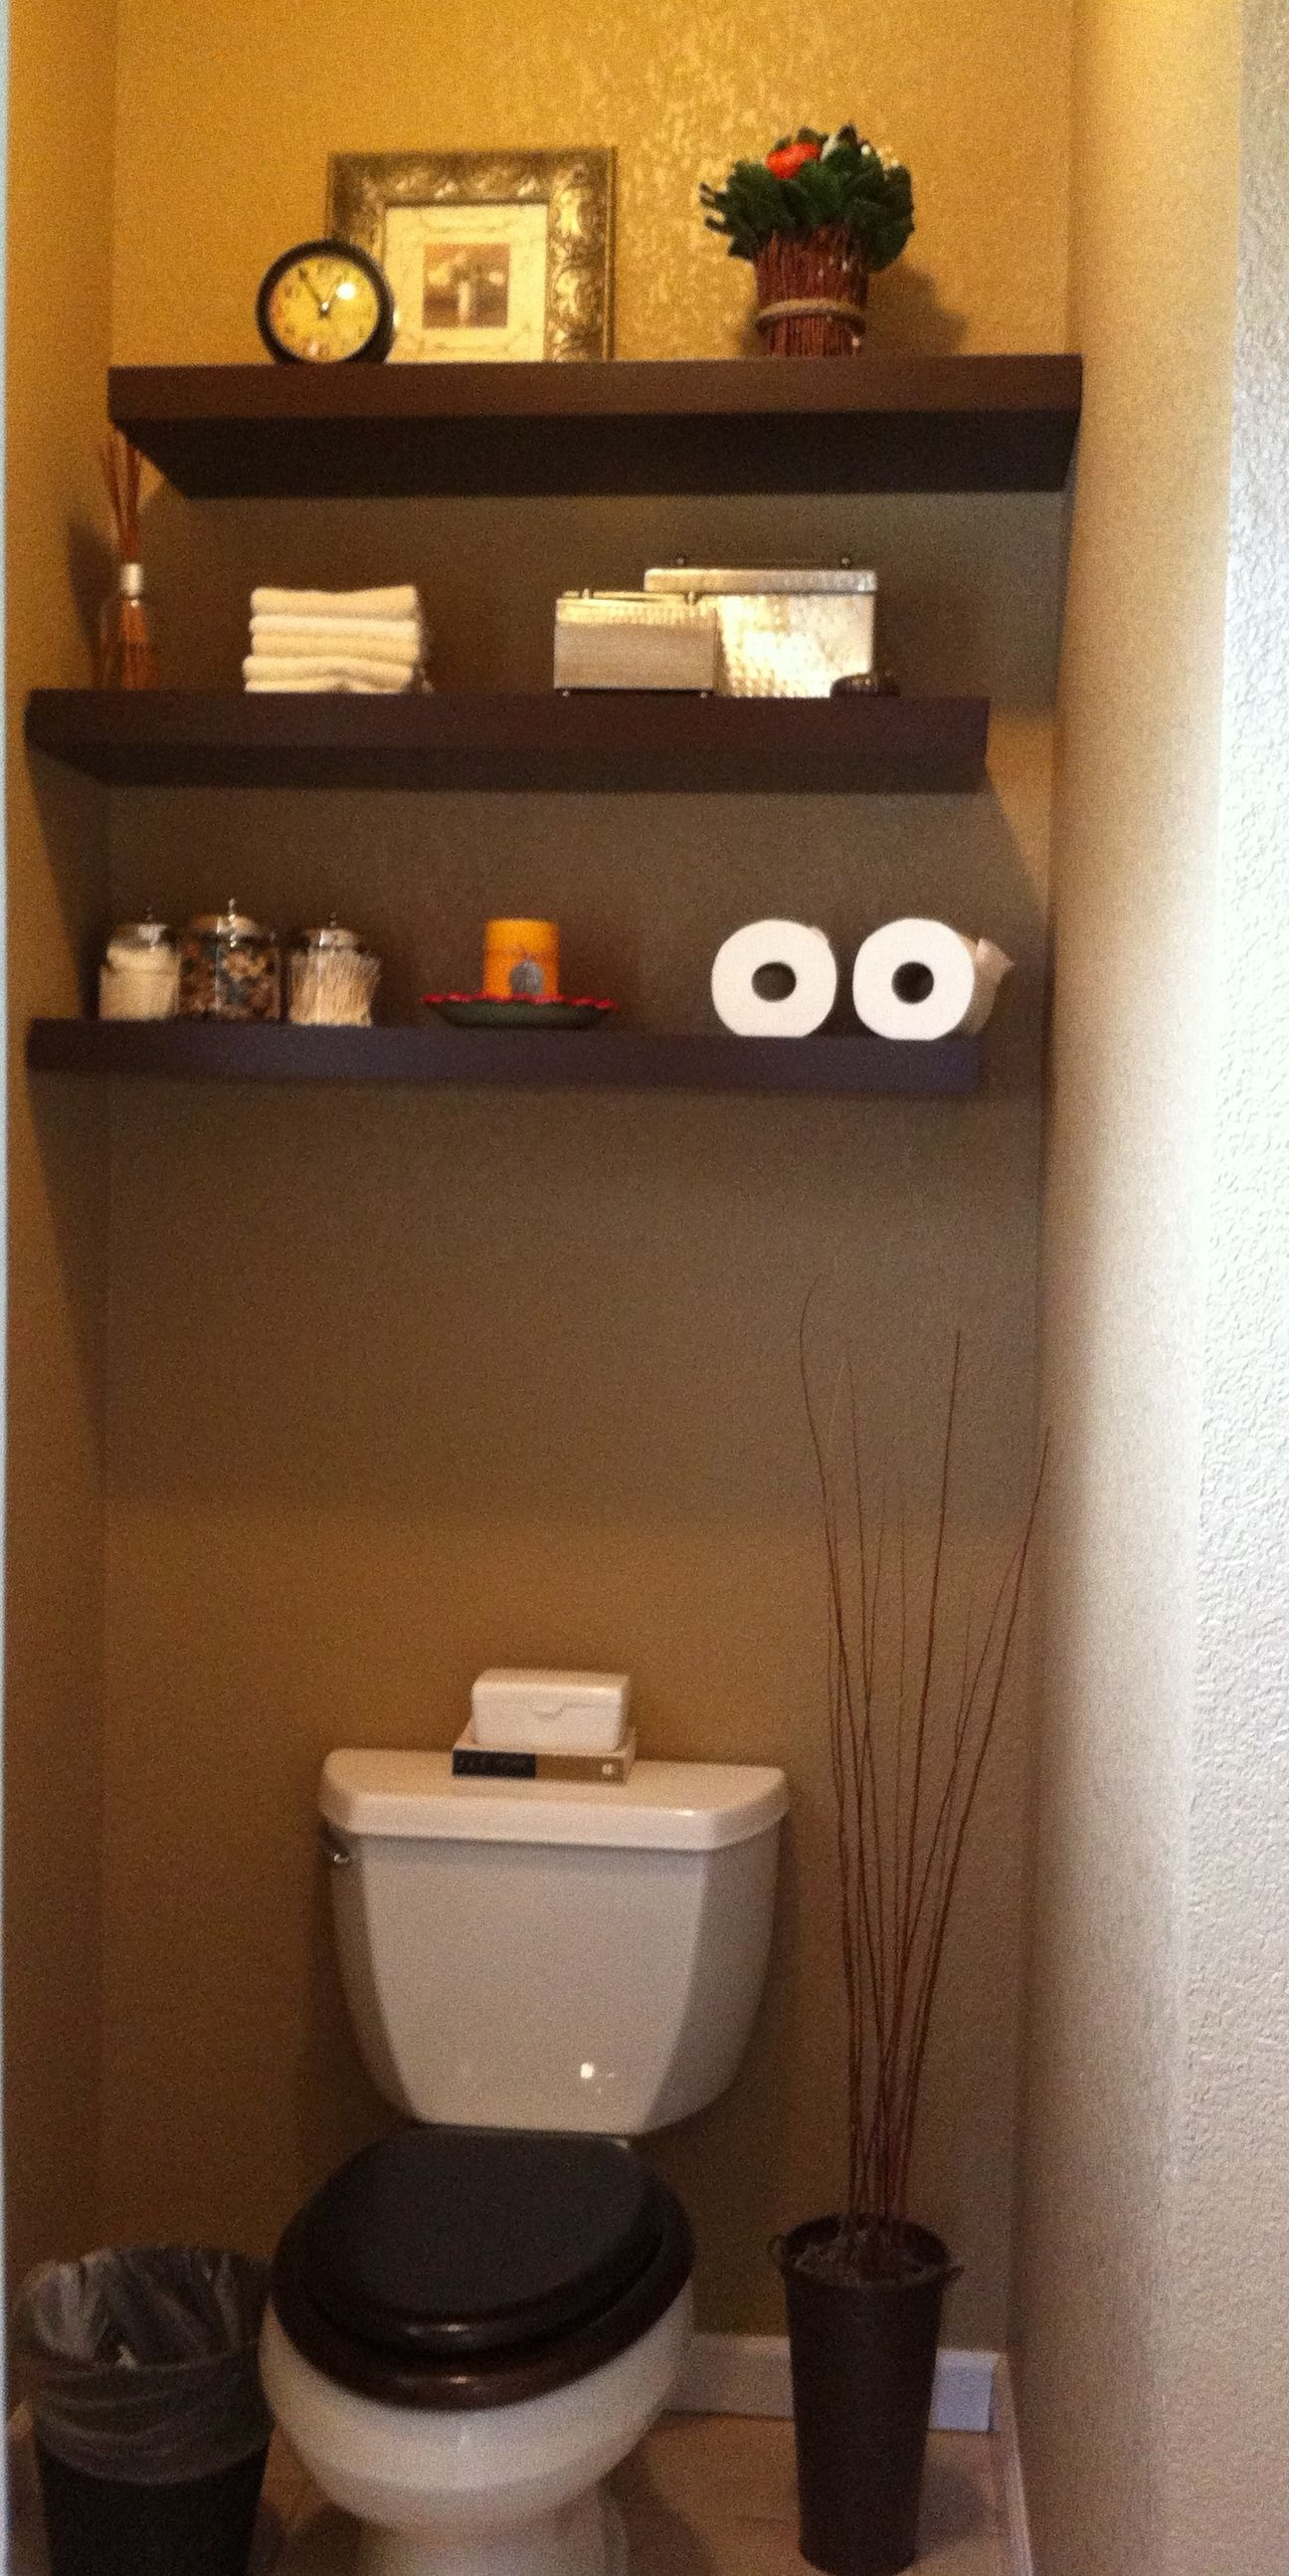 My Pinterest Inspired Project - Toilet room floating shelves ...